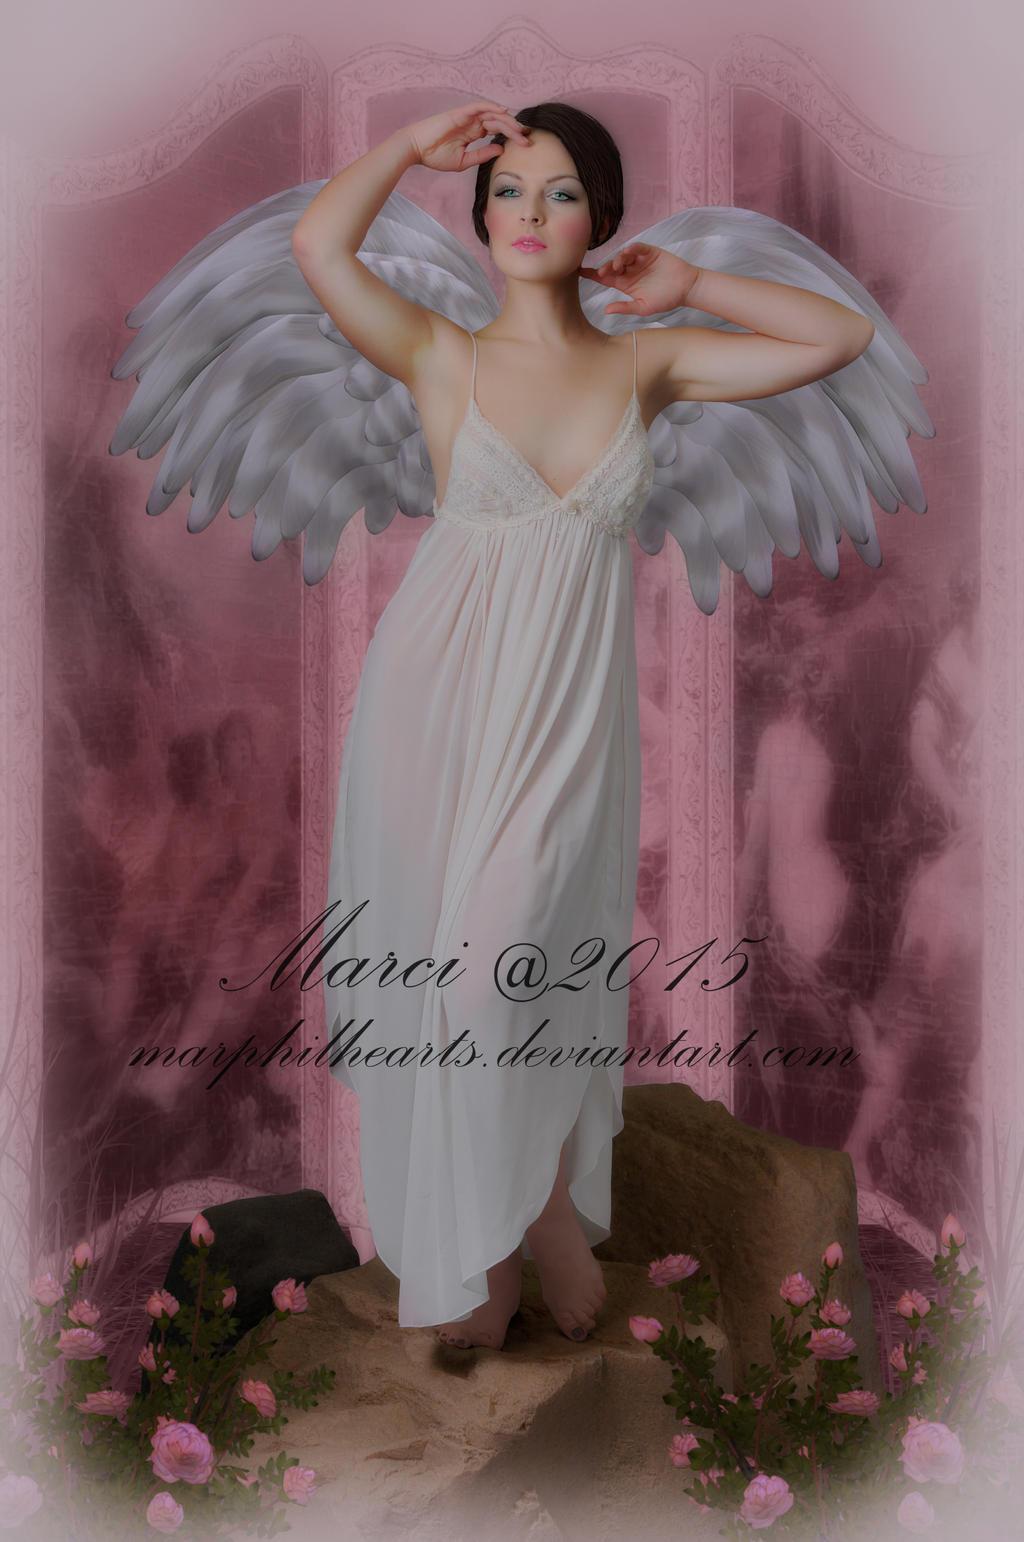 Cherub Princess by marphilhearts